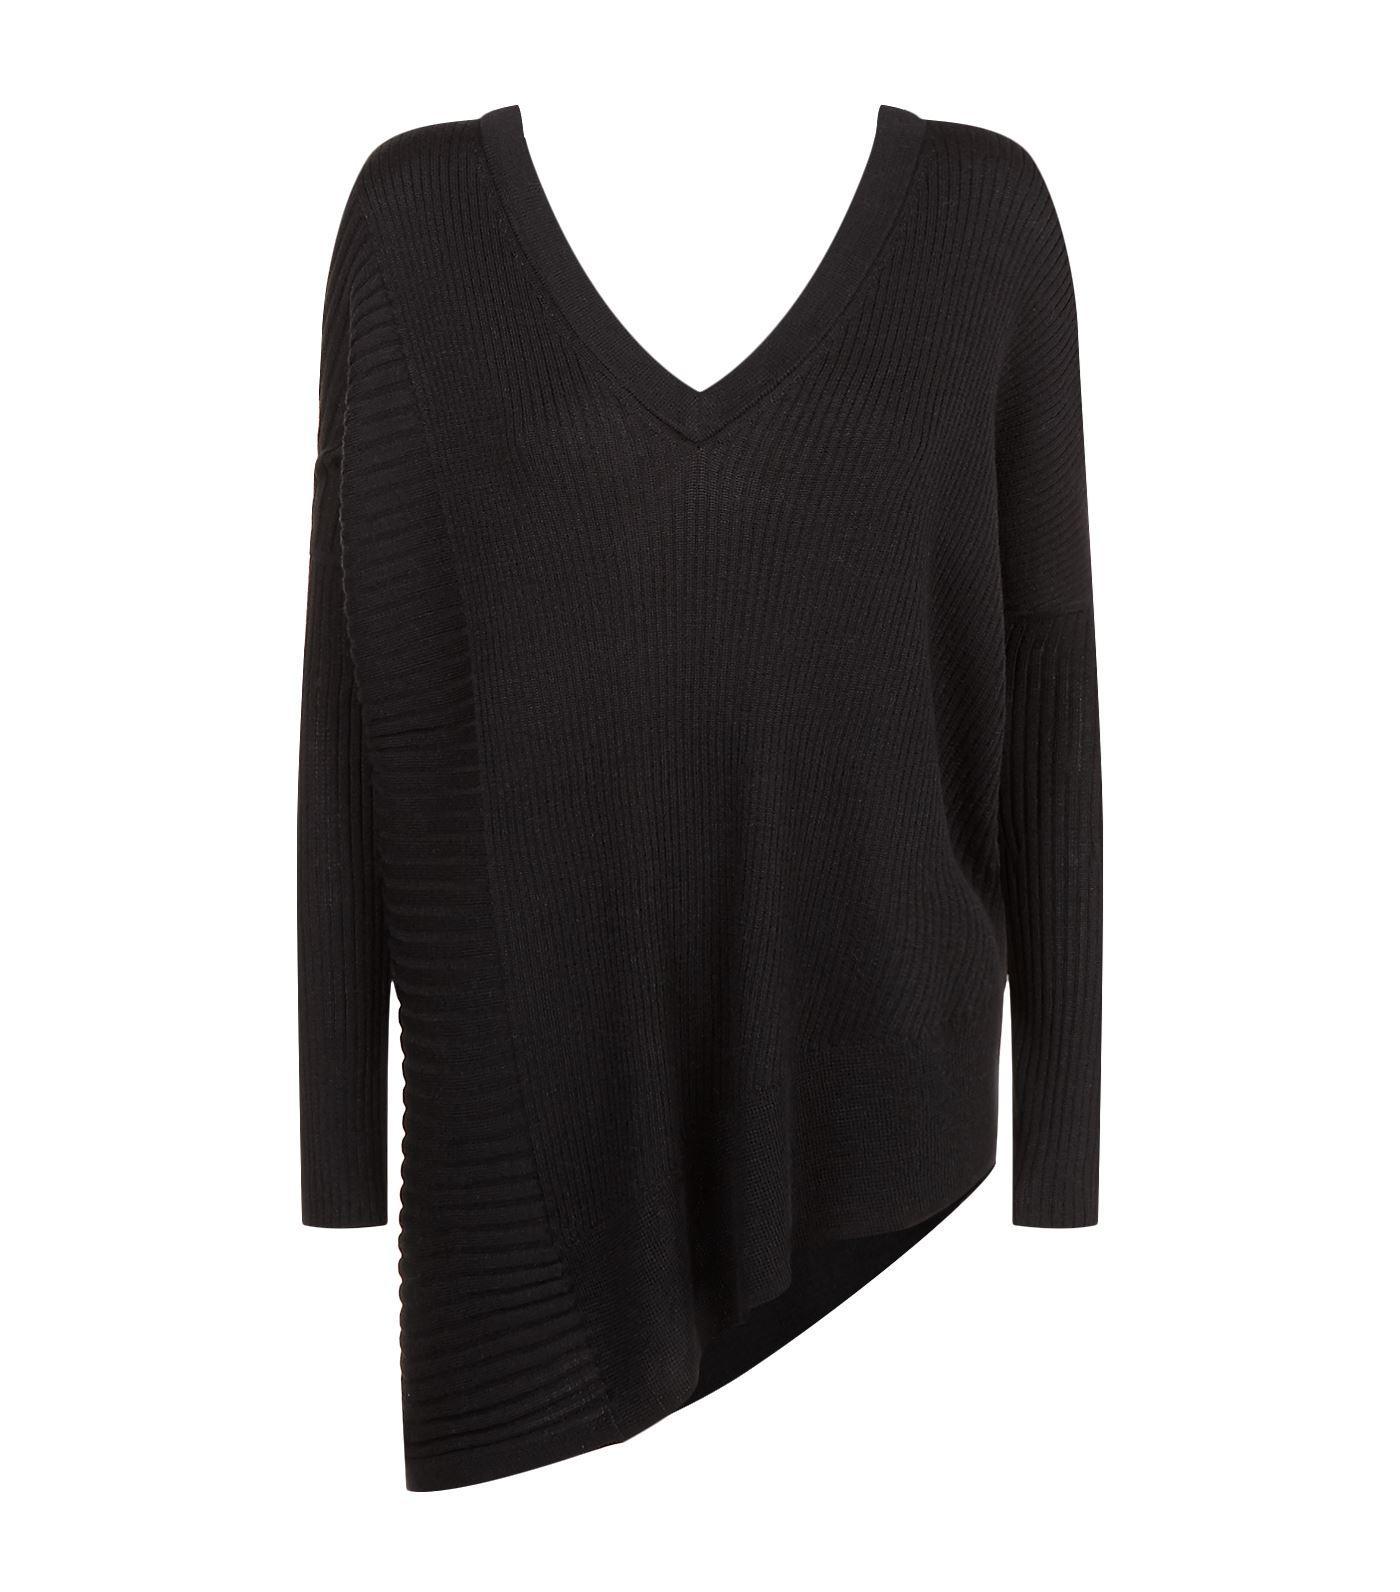 Allsaints Keld Olivo Asymmetric Sweater In Black